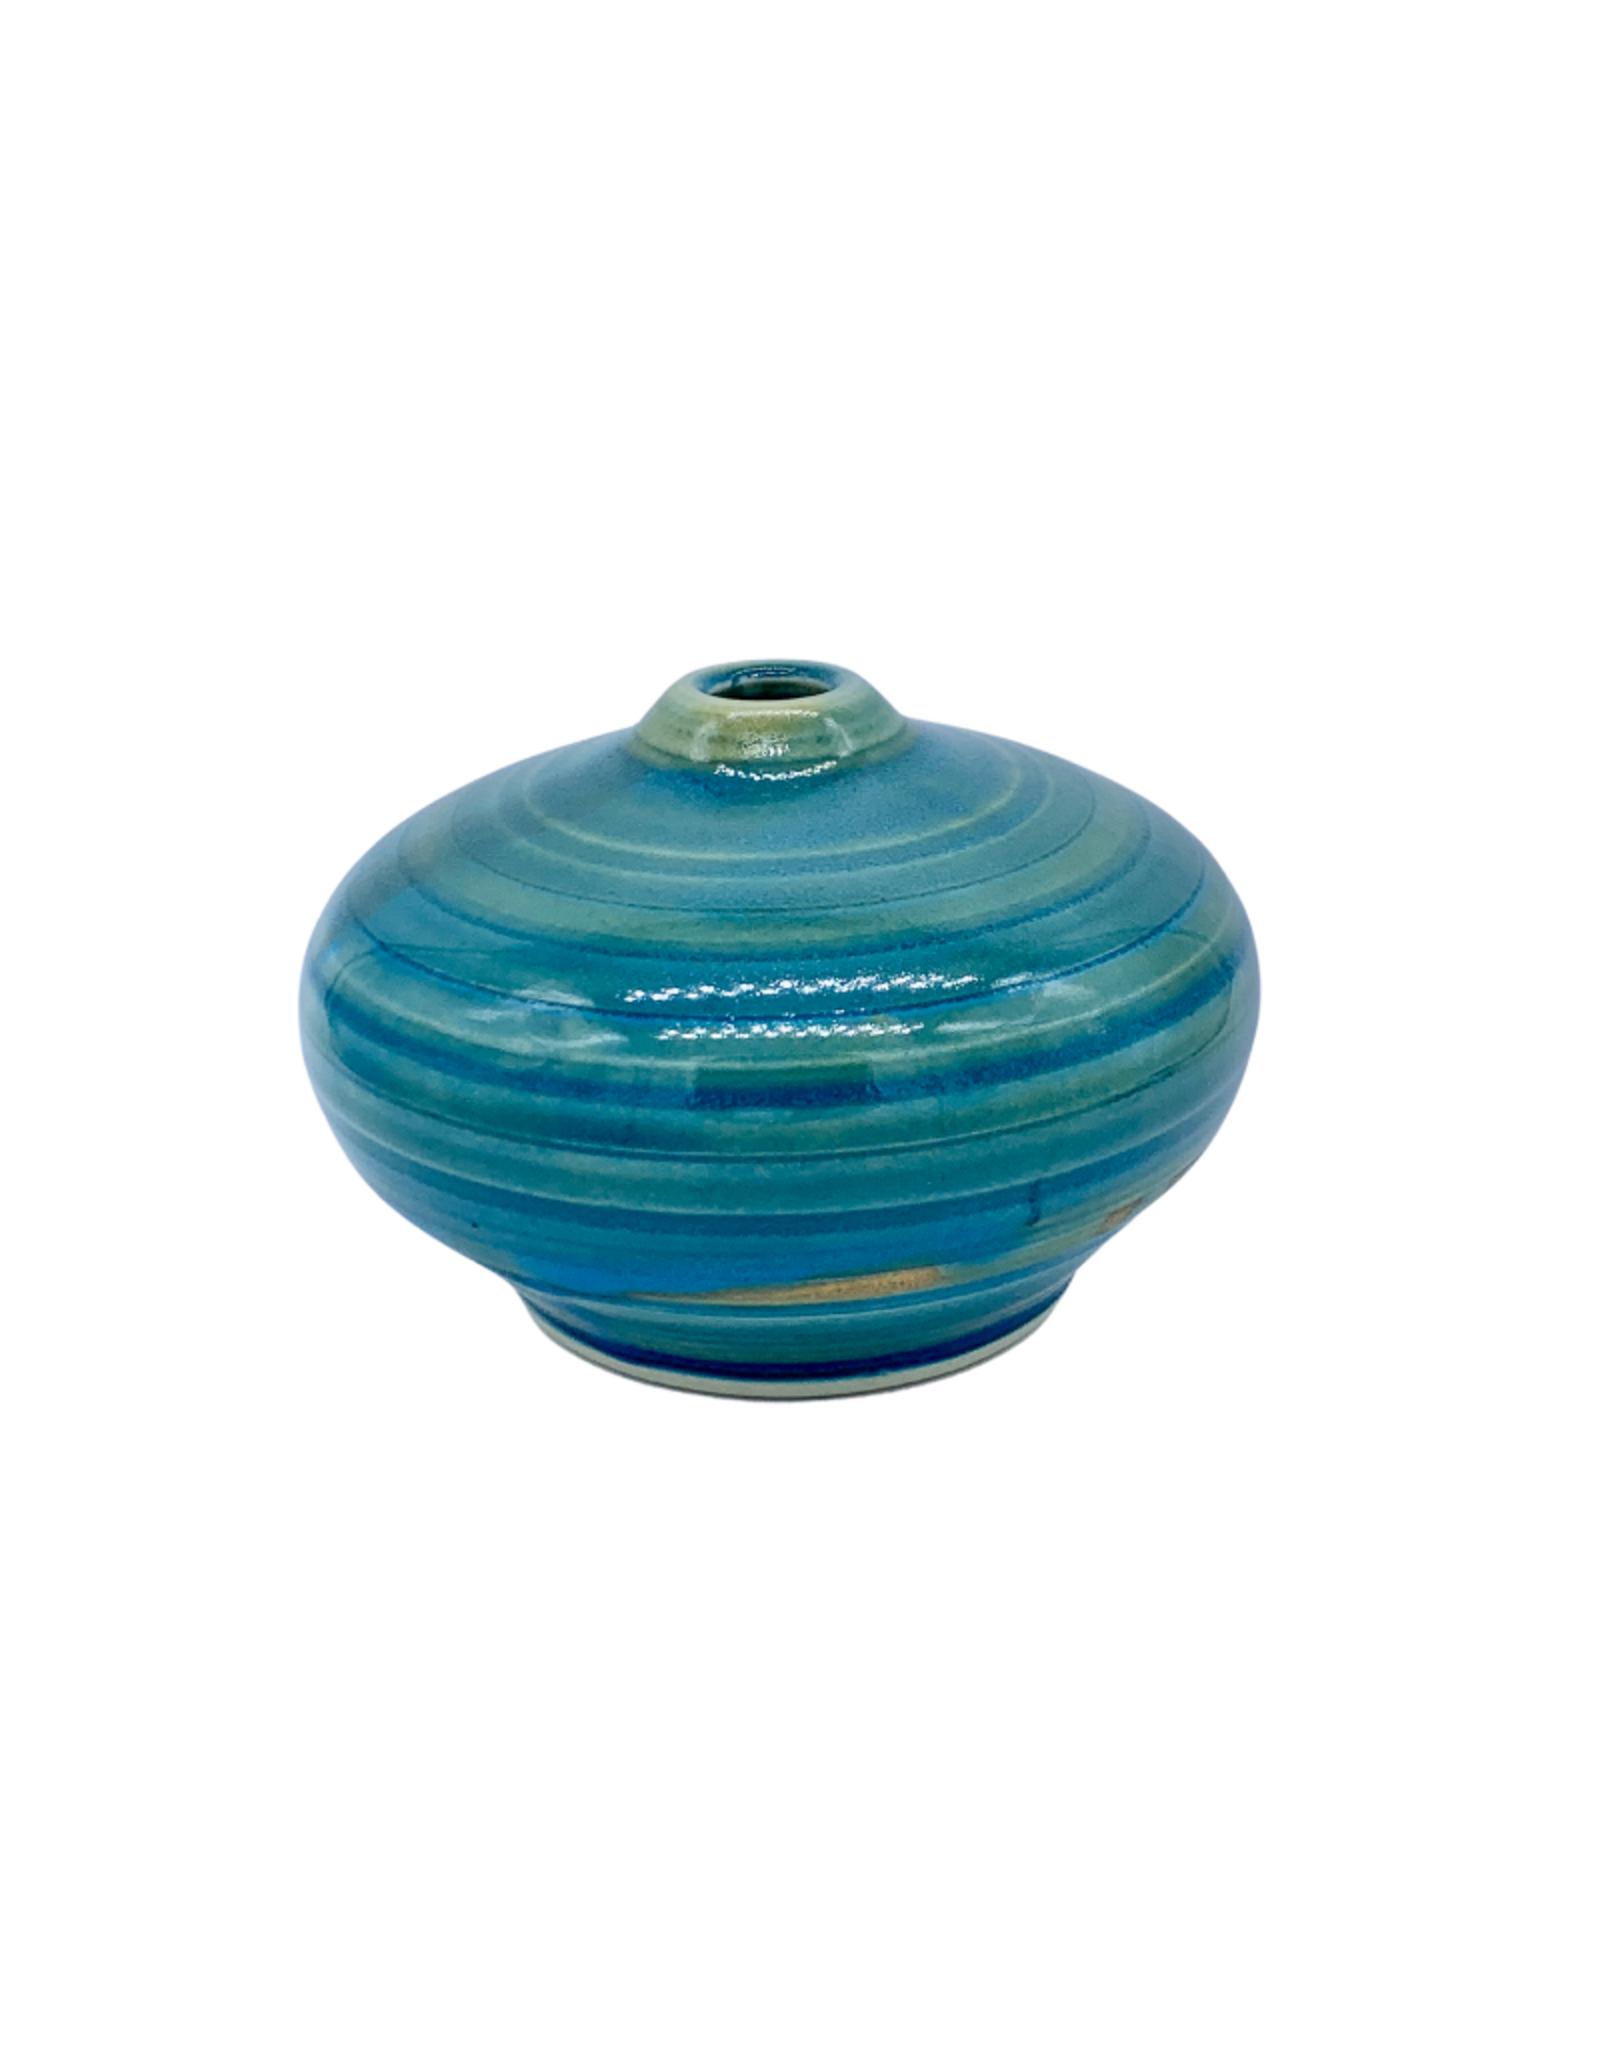 Richard Lau Pottery Persimmon Vase